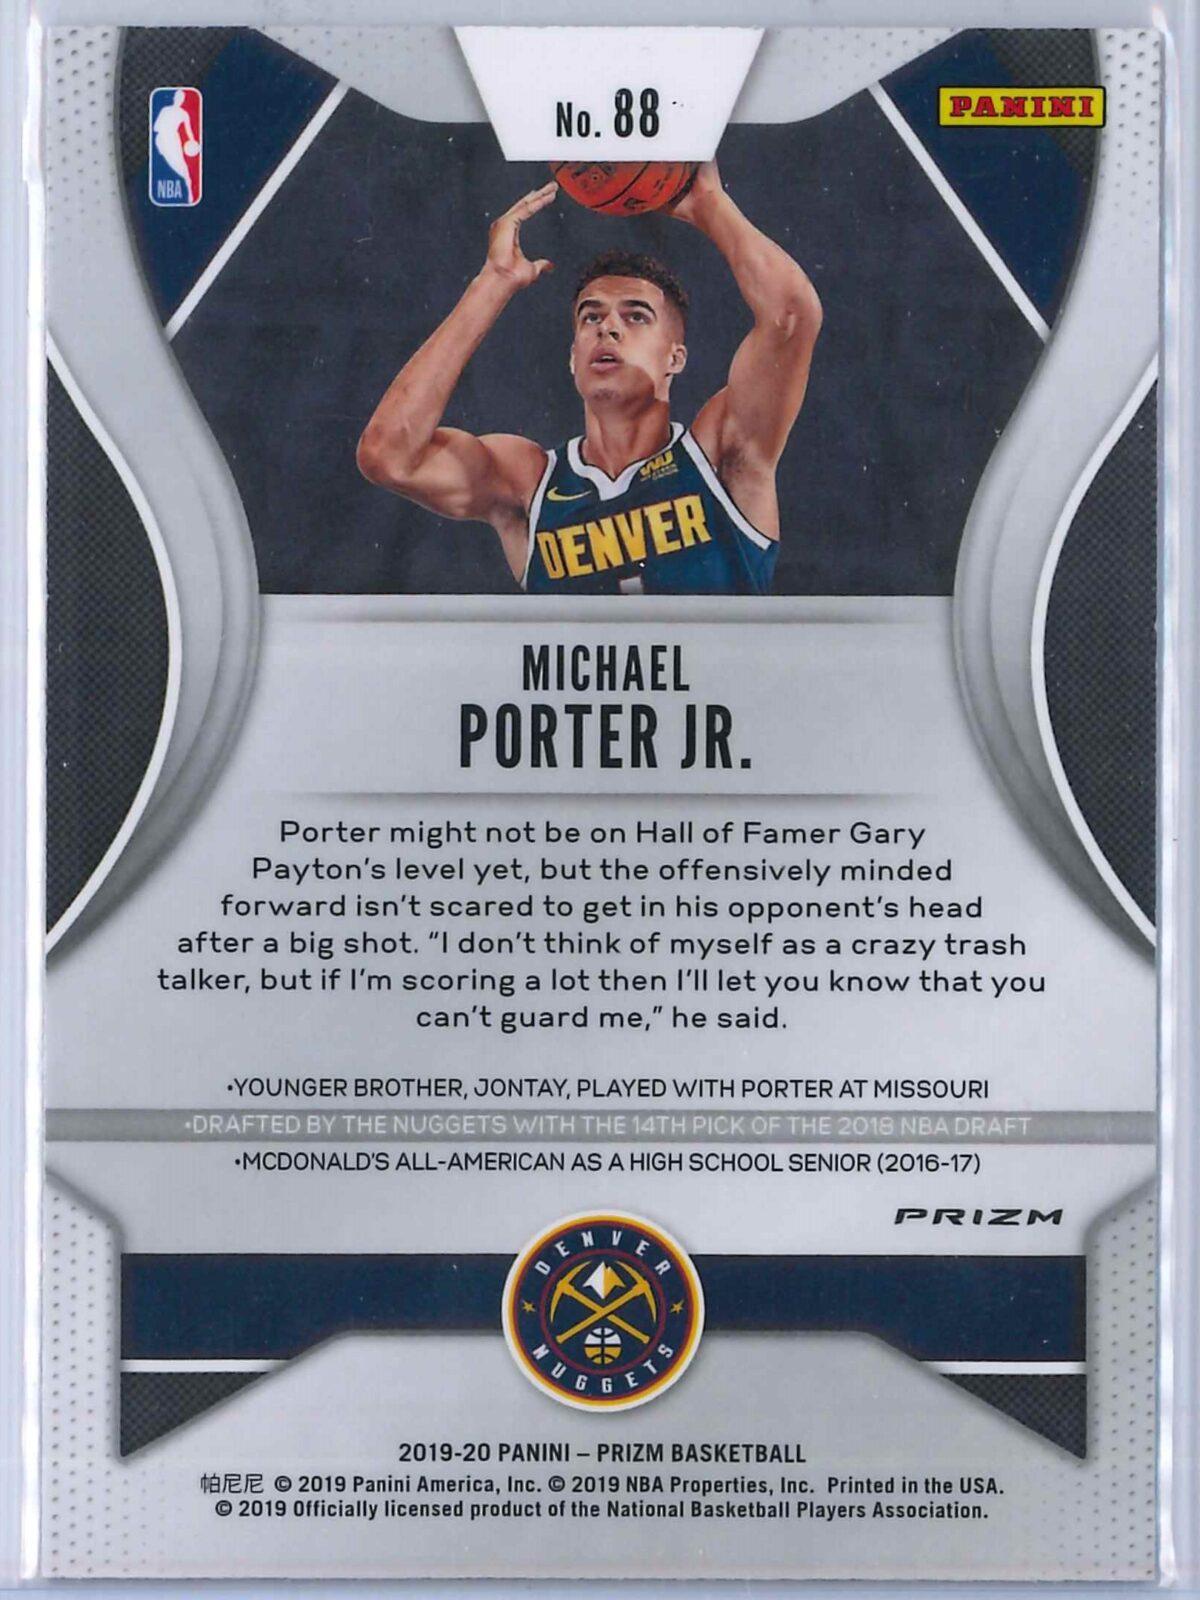 Michael Porter Jr. (1) Panini Prizm 2019-20 Base 2nd Year Red White Blue